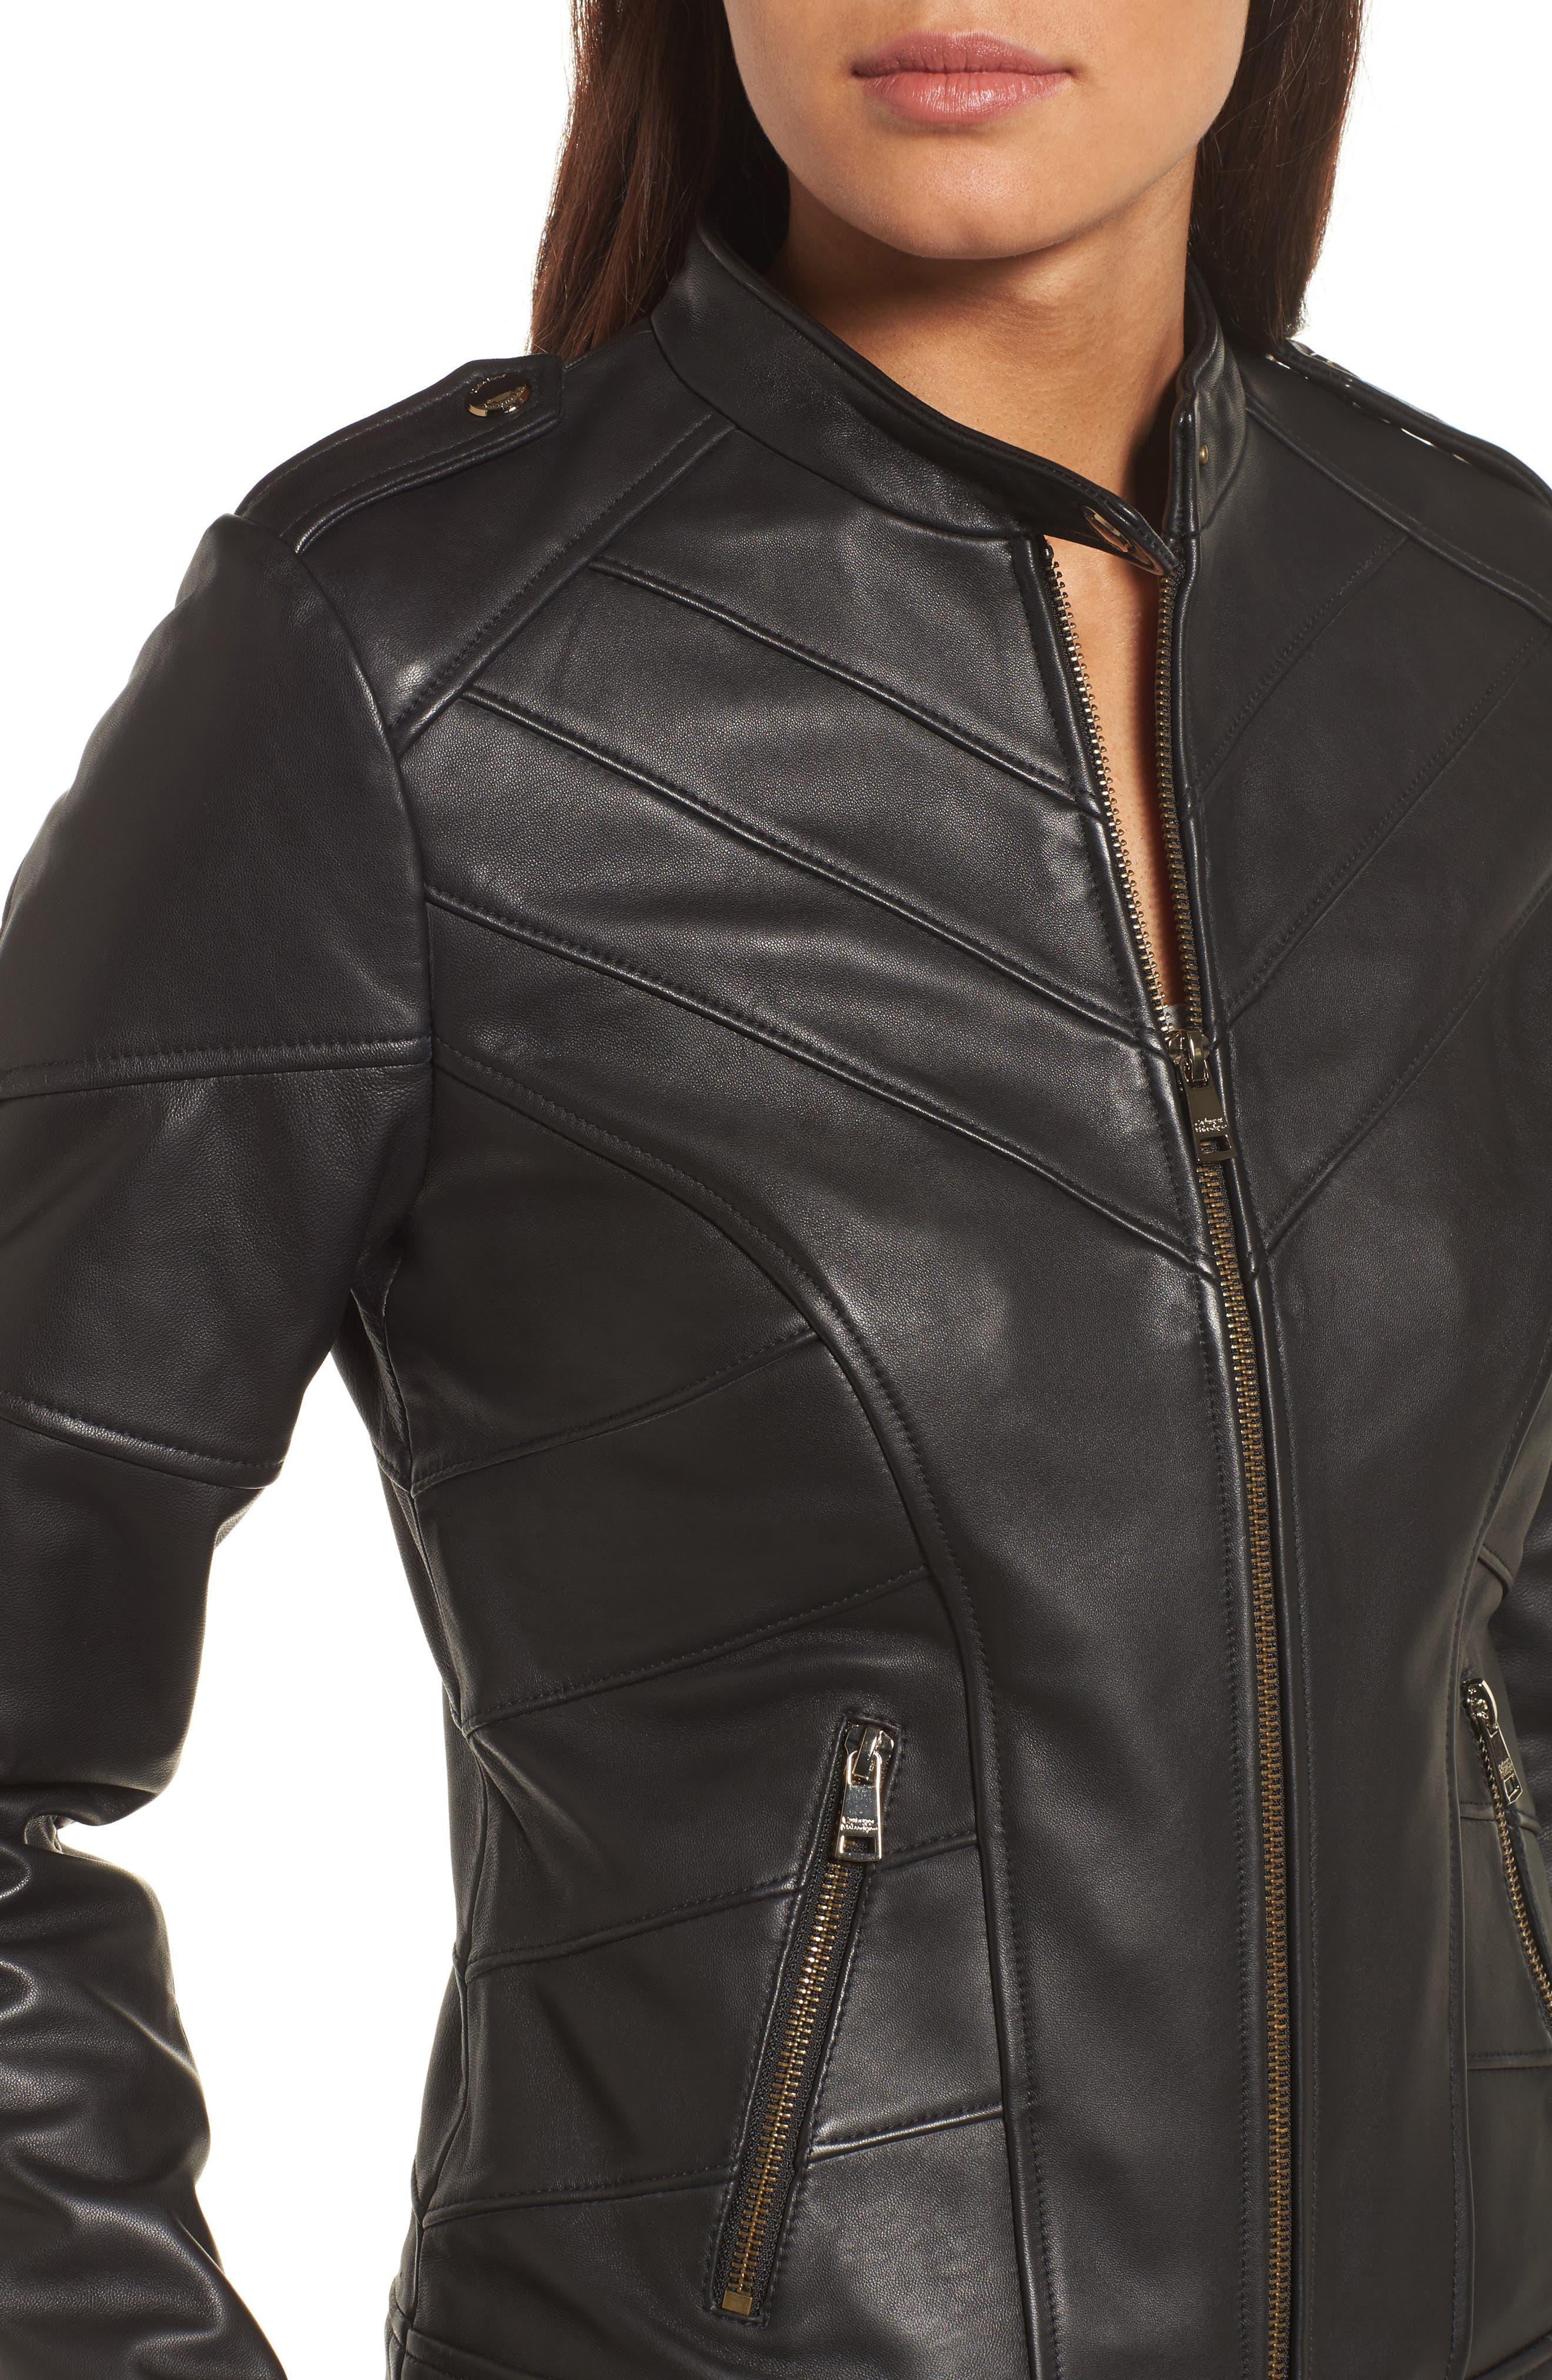 Chevron Seam Leather Jacket,                             Alternate thumbnail 4, color,                             001